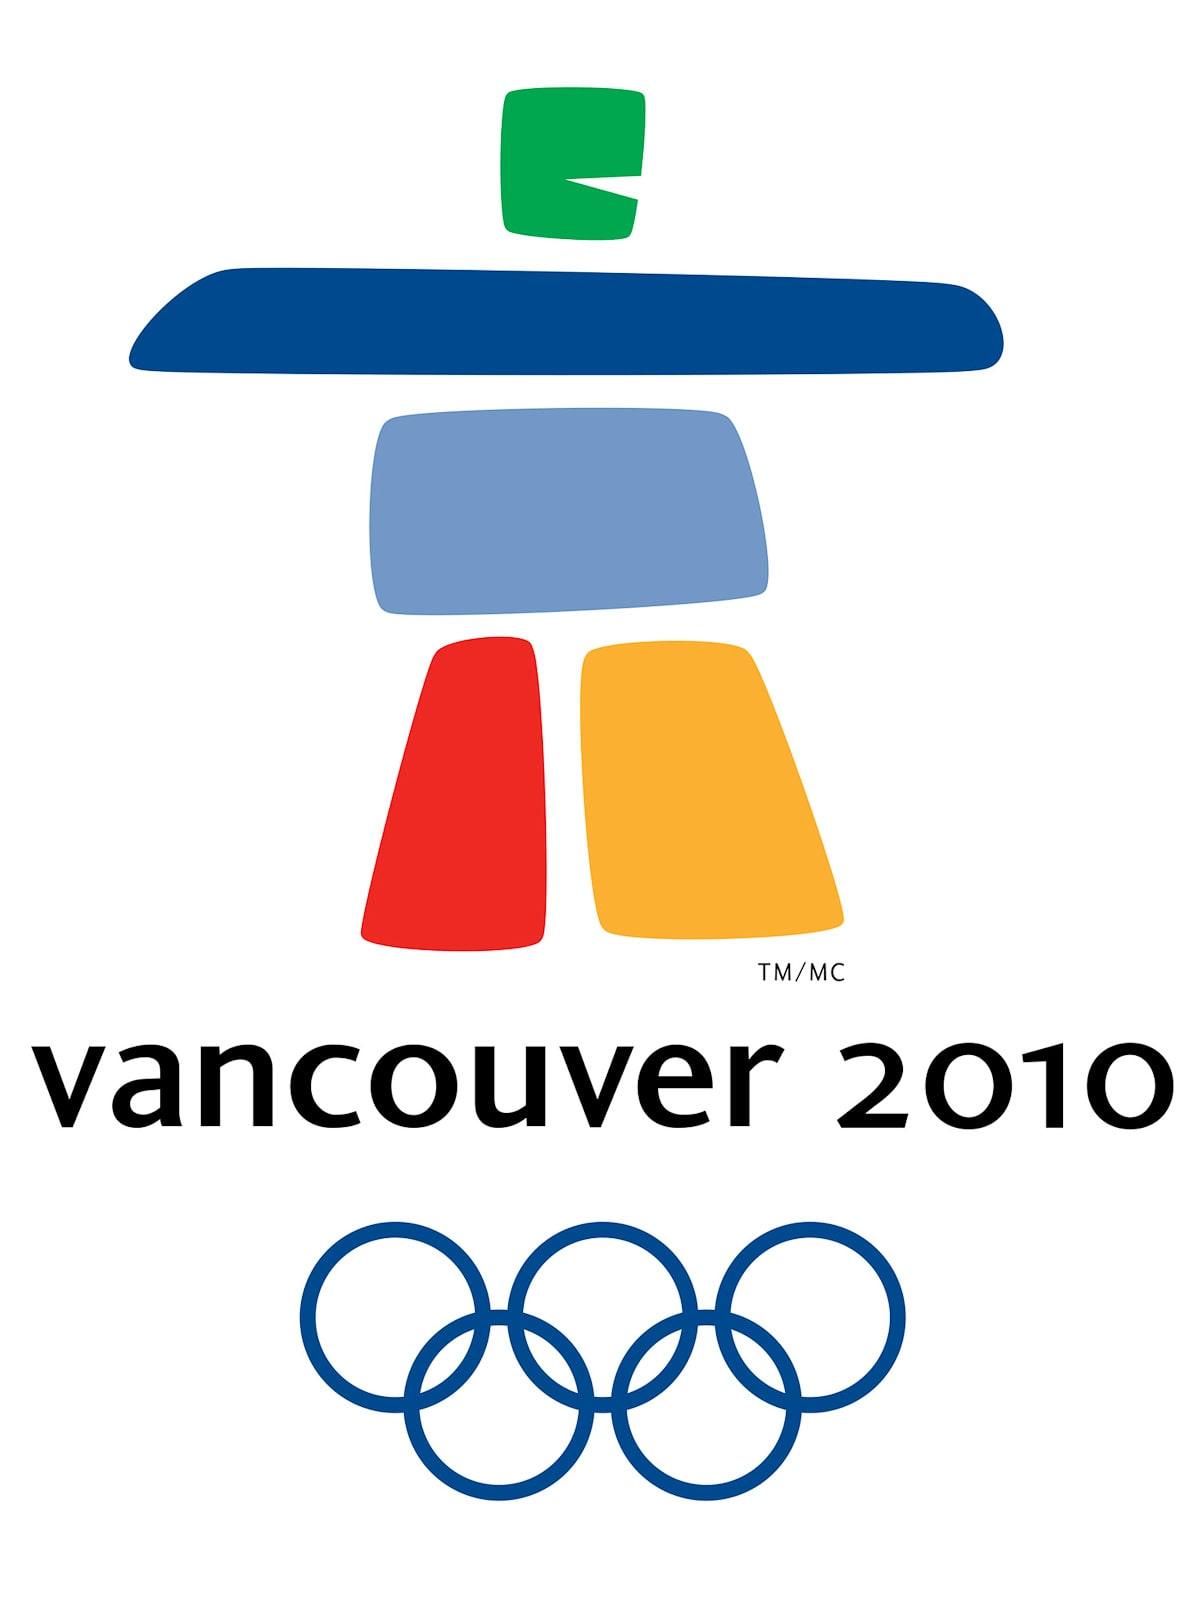 News_Winter Olympics_Vancouver 2010_logo